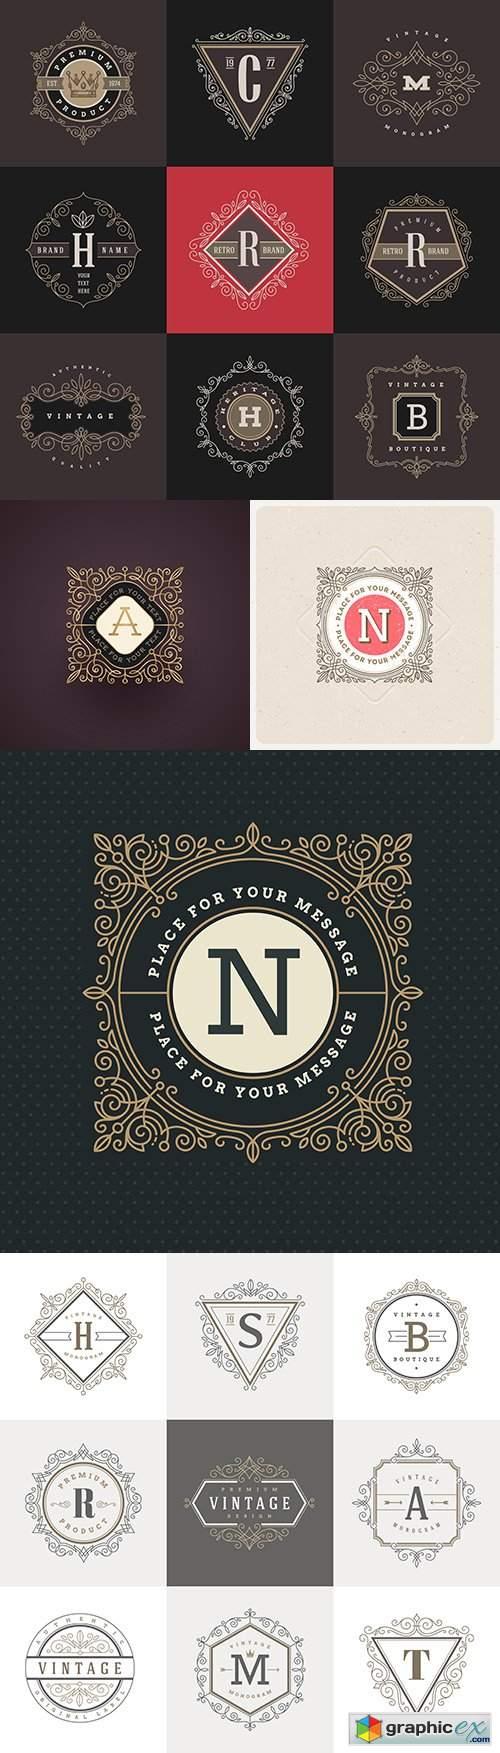 Monogram vintage calligraphic decoration emblem design